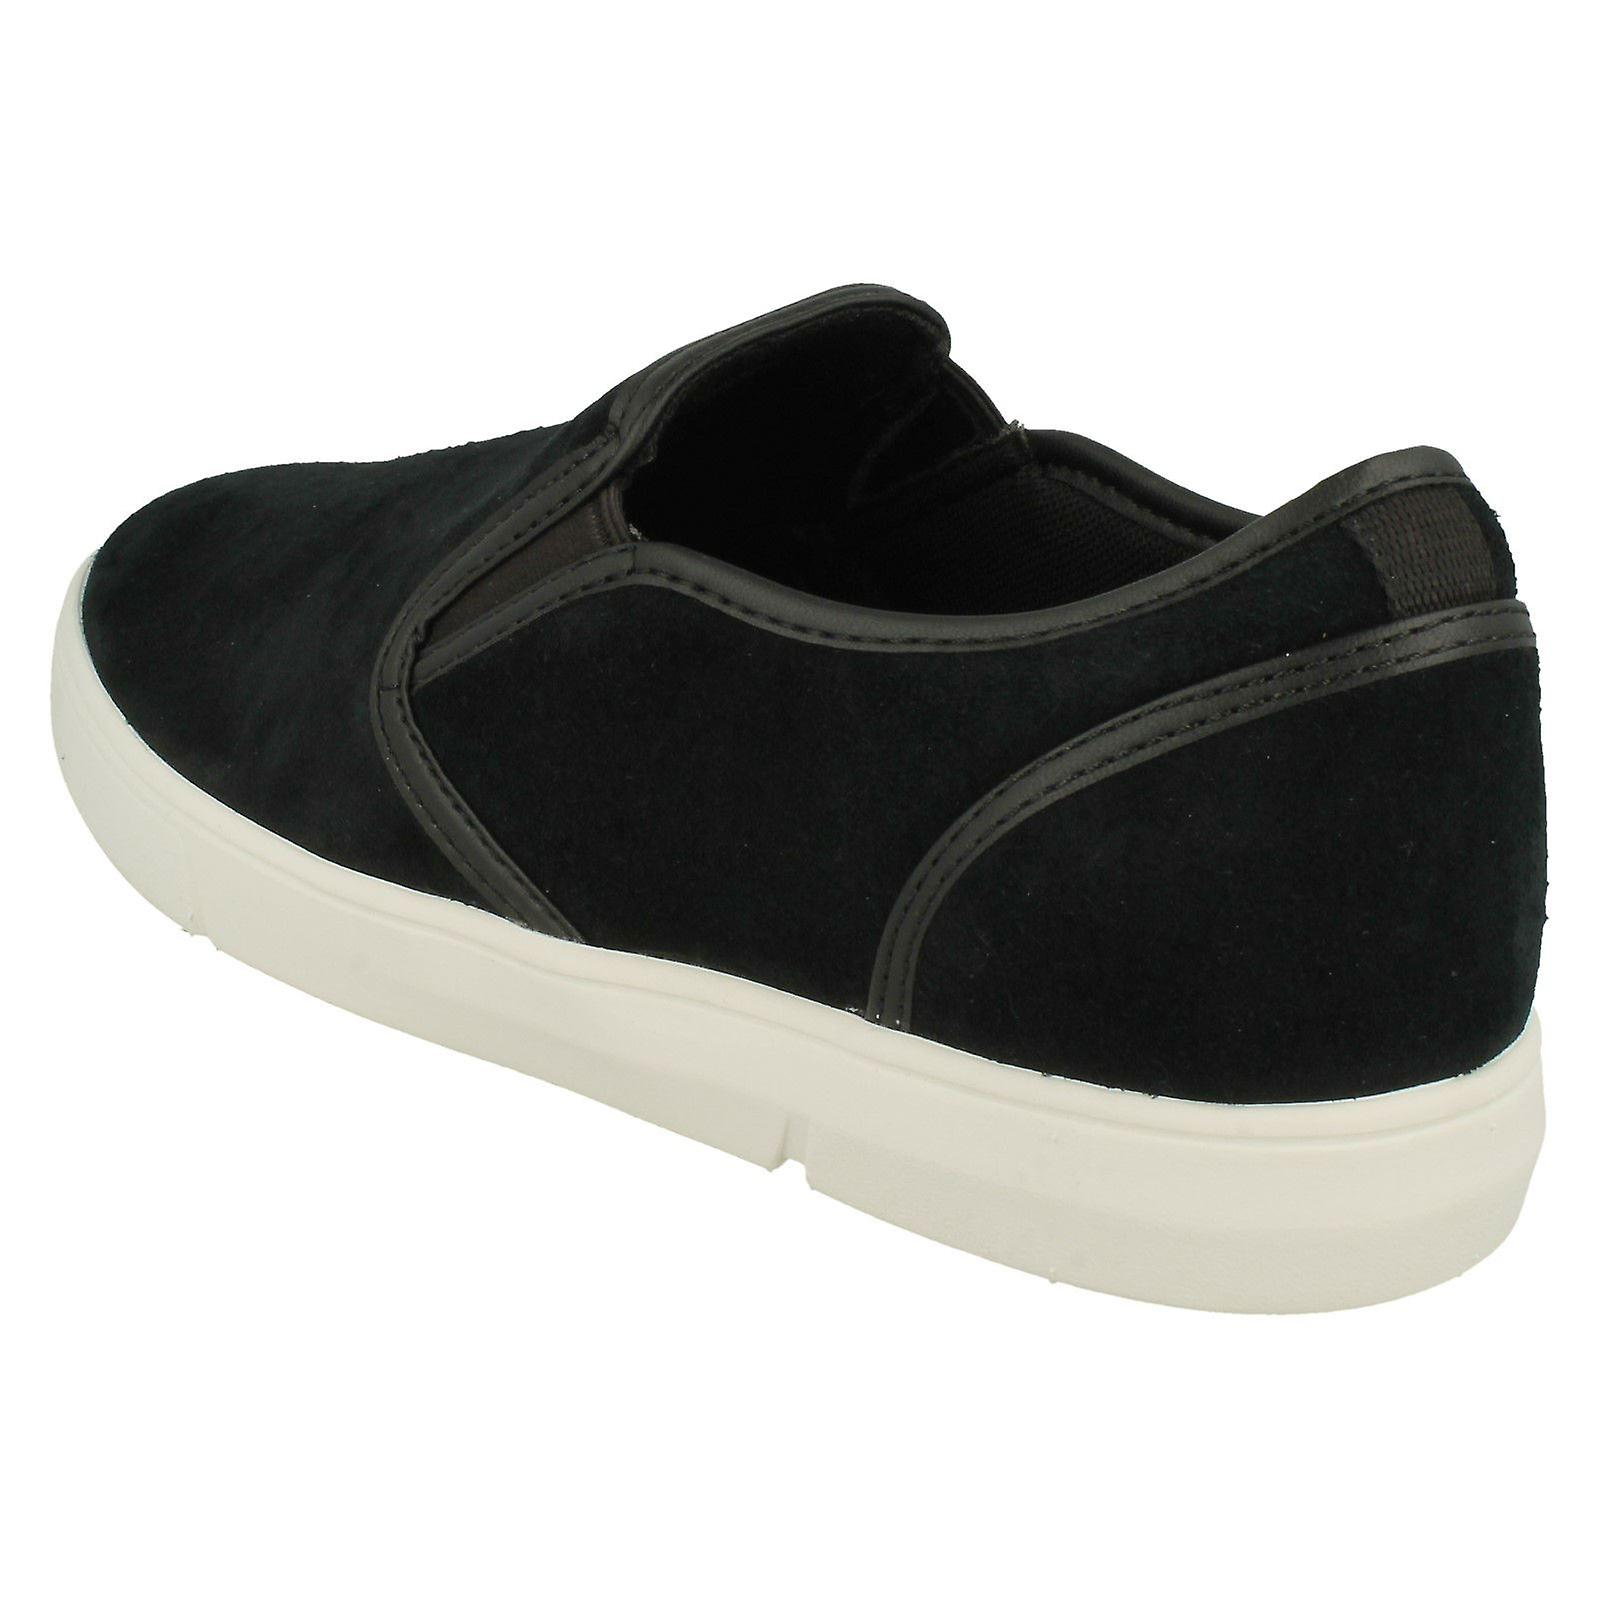 Slip Mens Clarks Occasionnels Chaussures Landry Étape